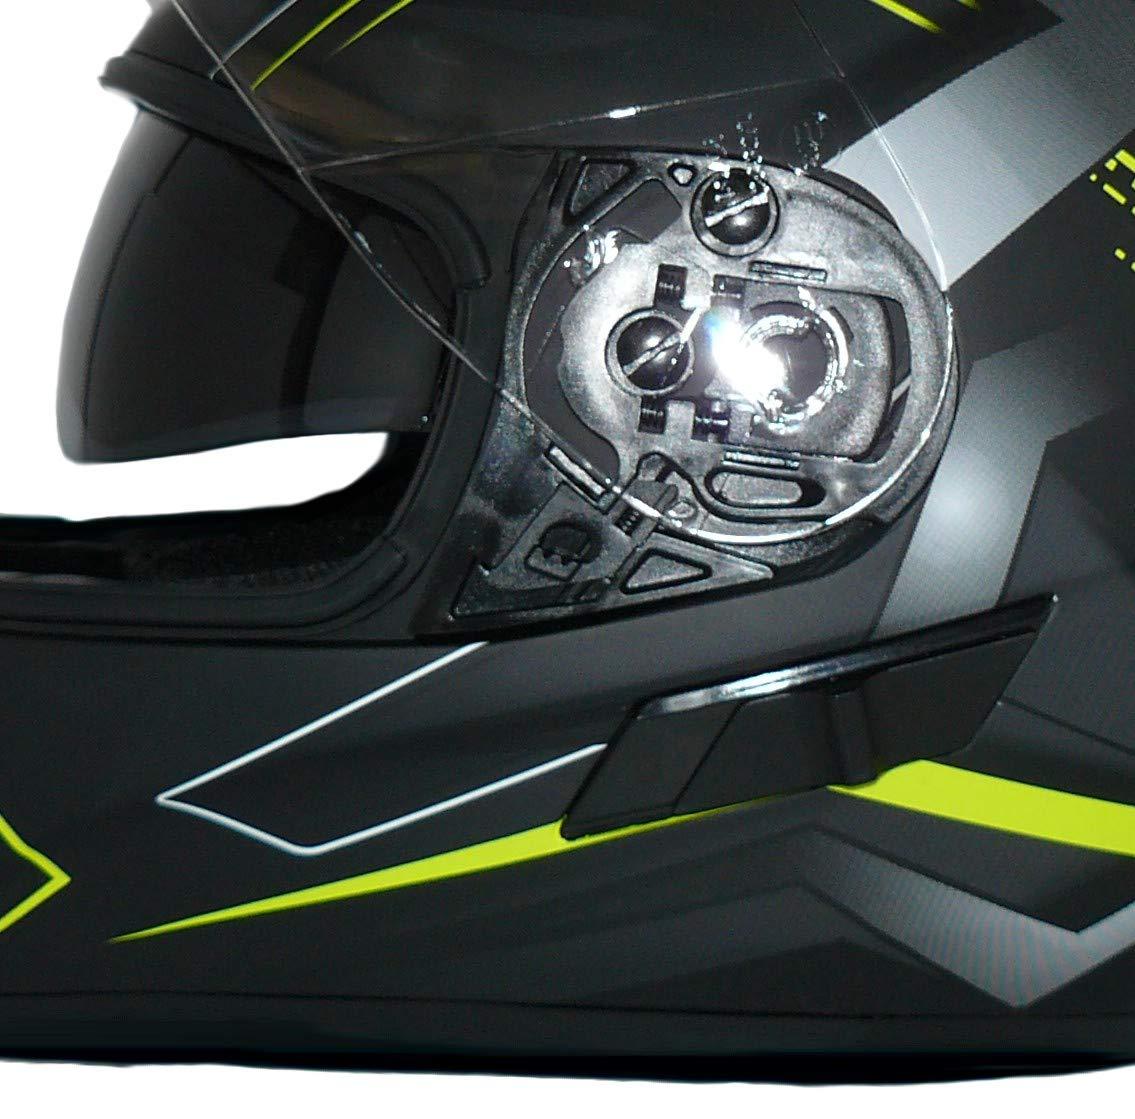 Black XS Protectwear Casco integral con visera H520-Arrow-GB Talla XS